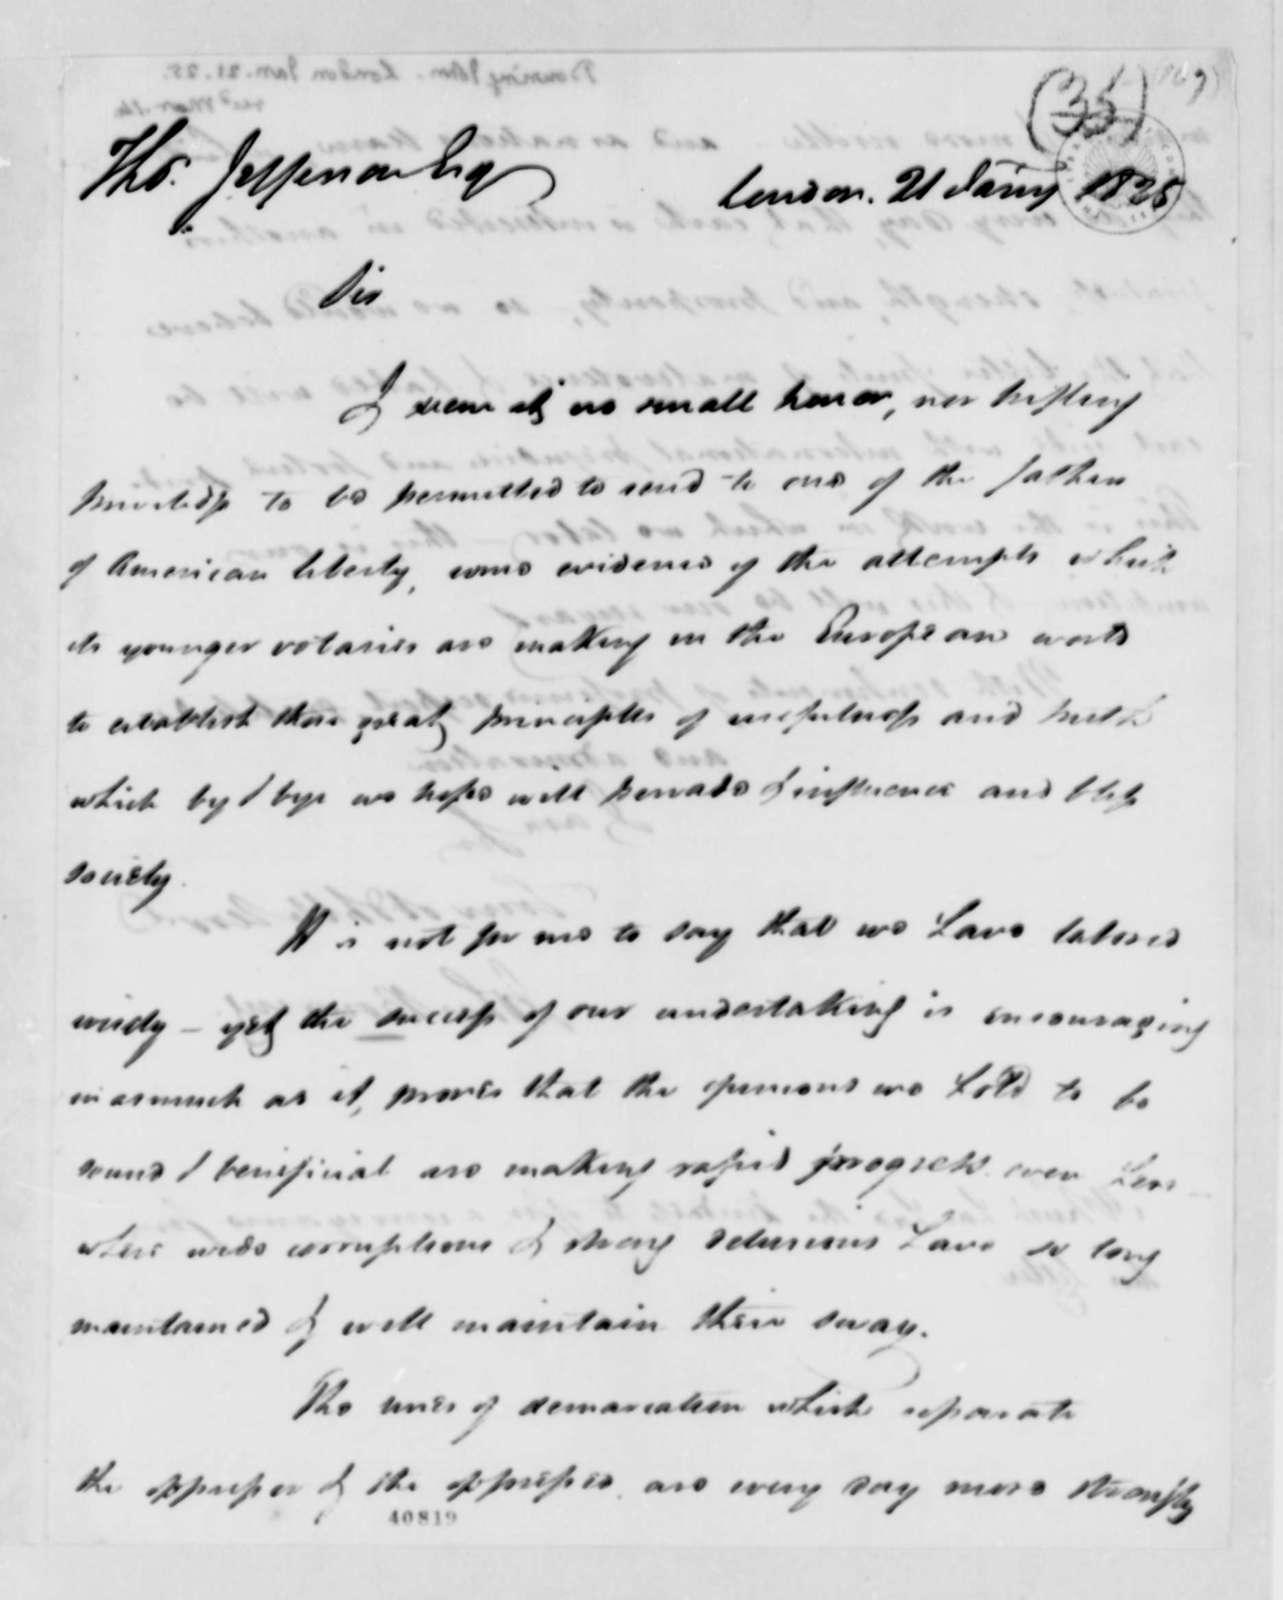 John Bowring to Thomas Jefferson, January 21, 1825